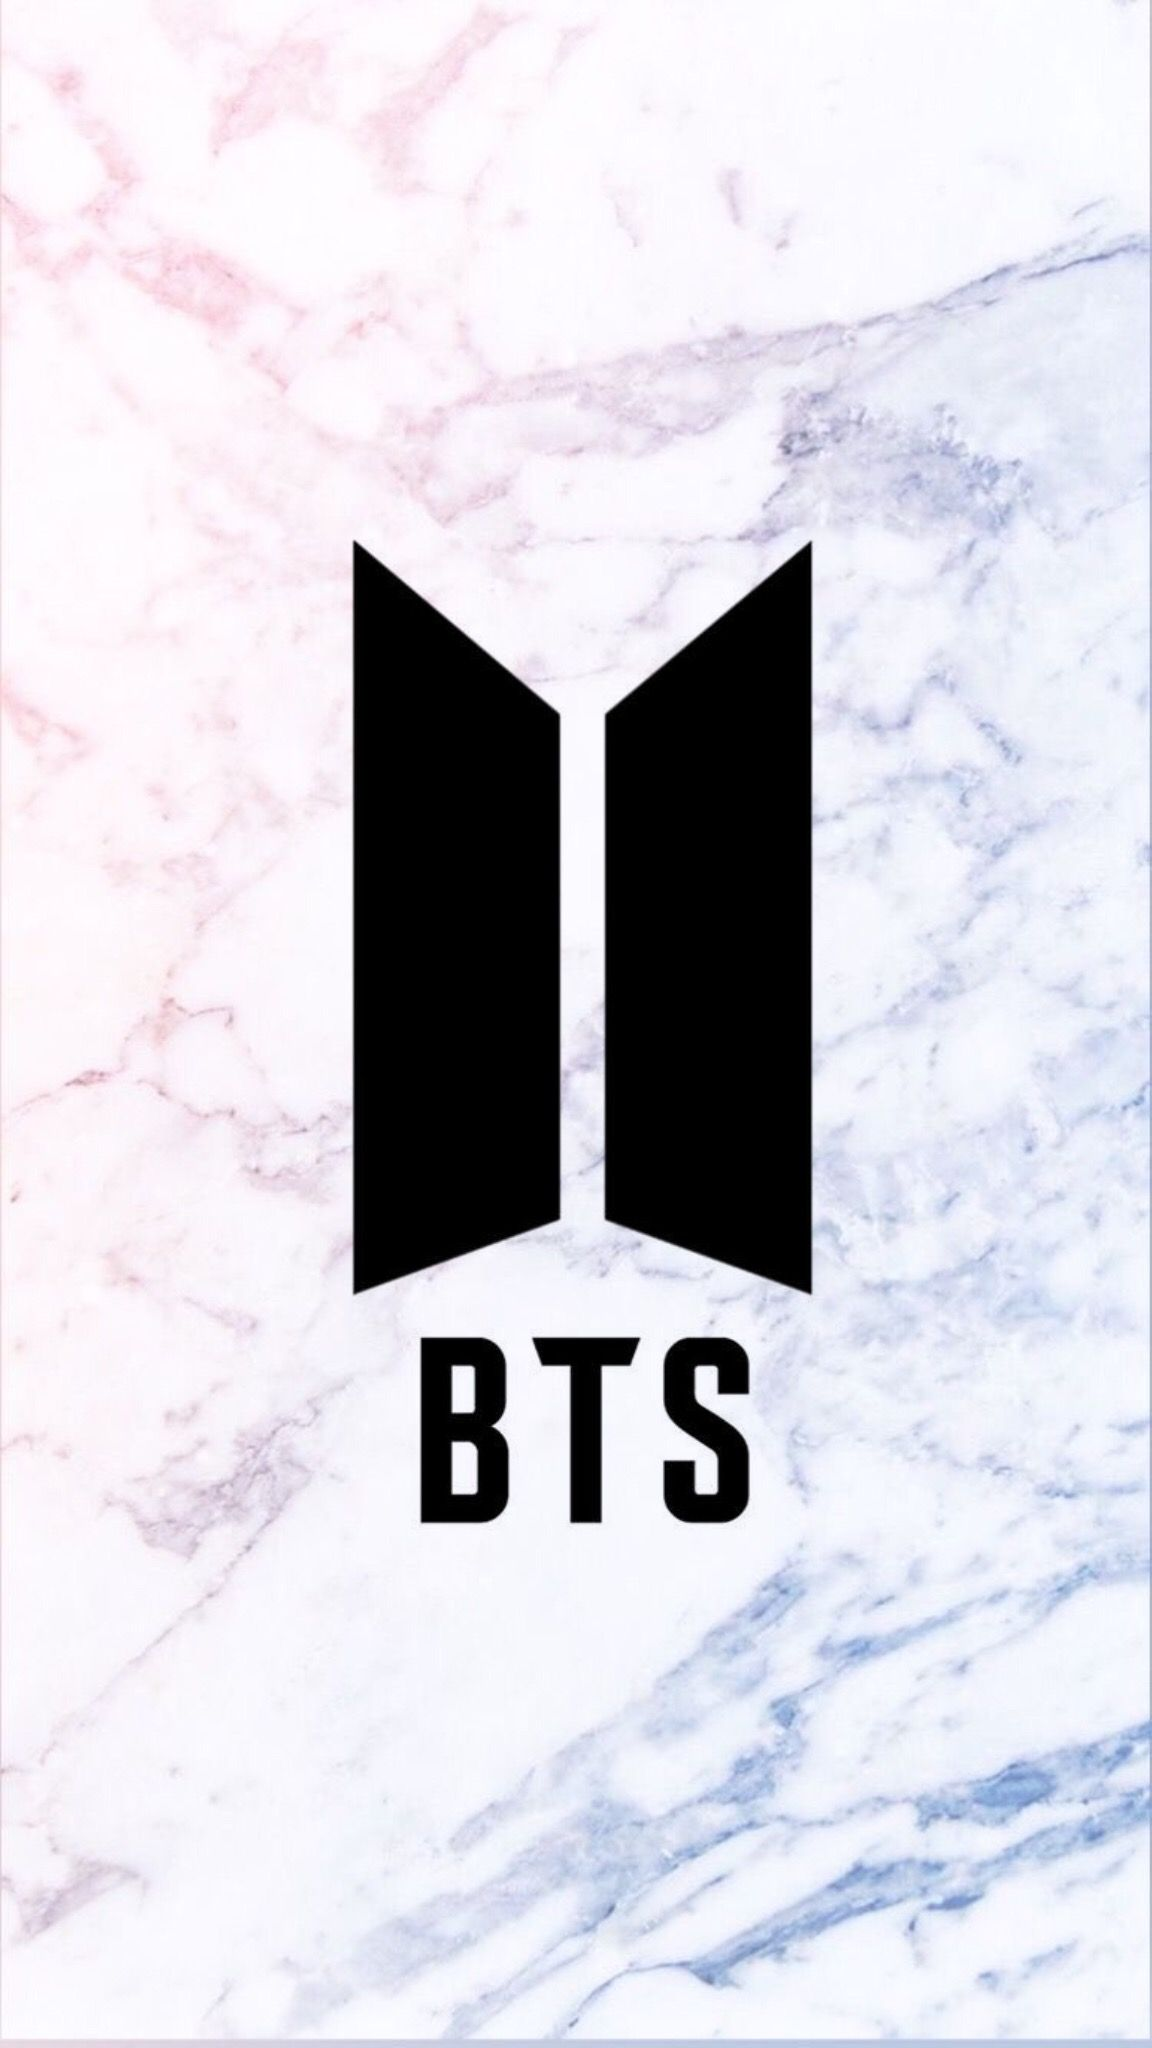 Bts Logo Wallpaper Galaxy Imgurl